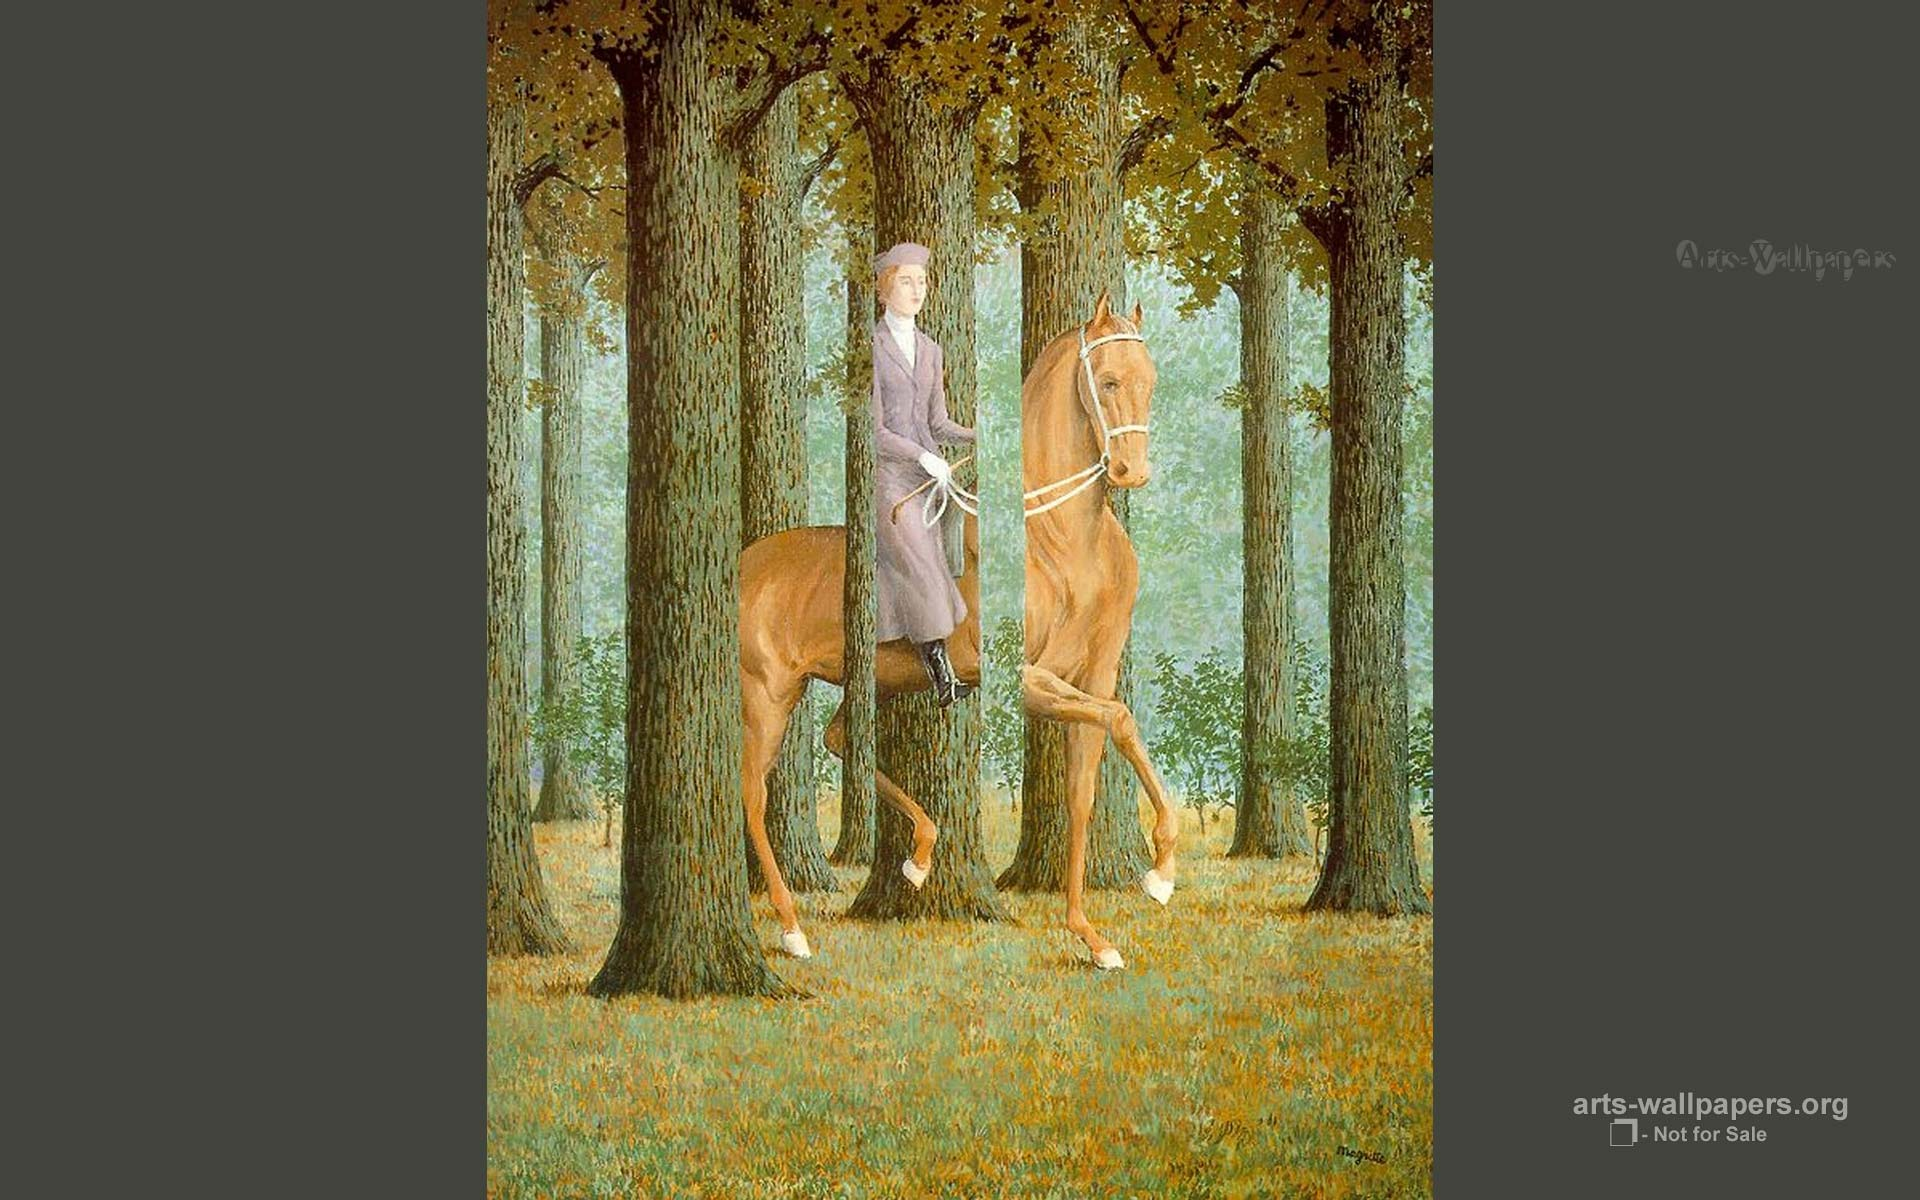 rene magritte wallpaper 02 1920x1200